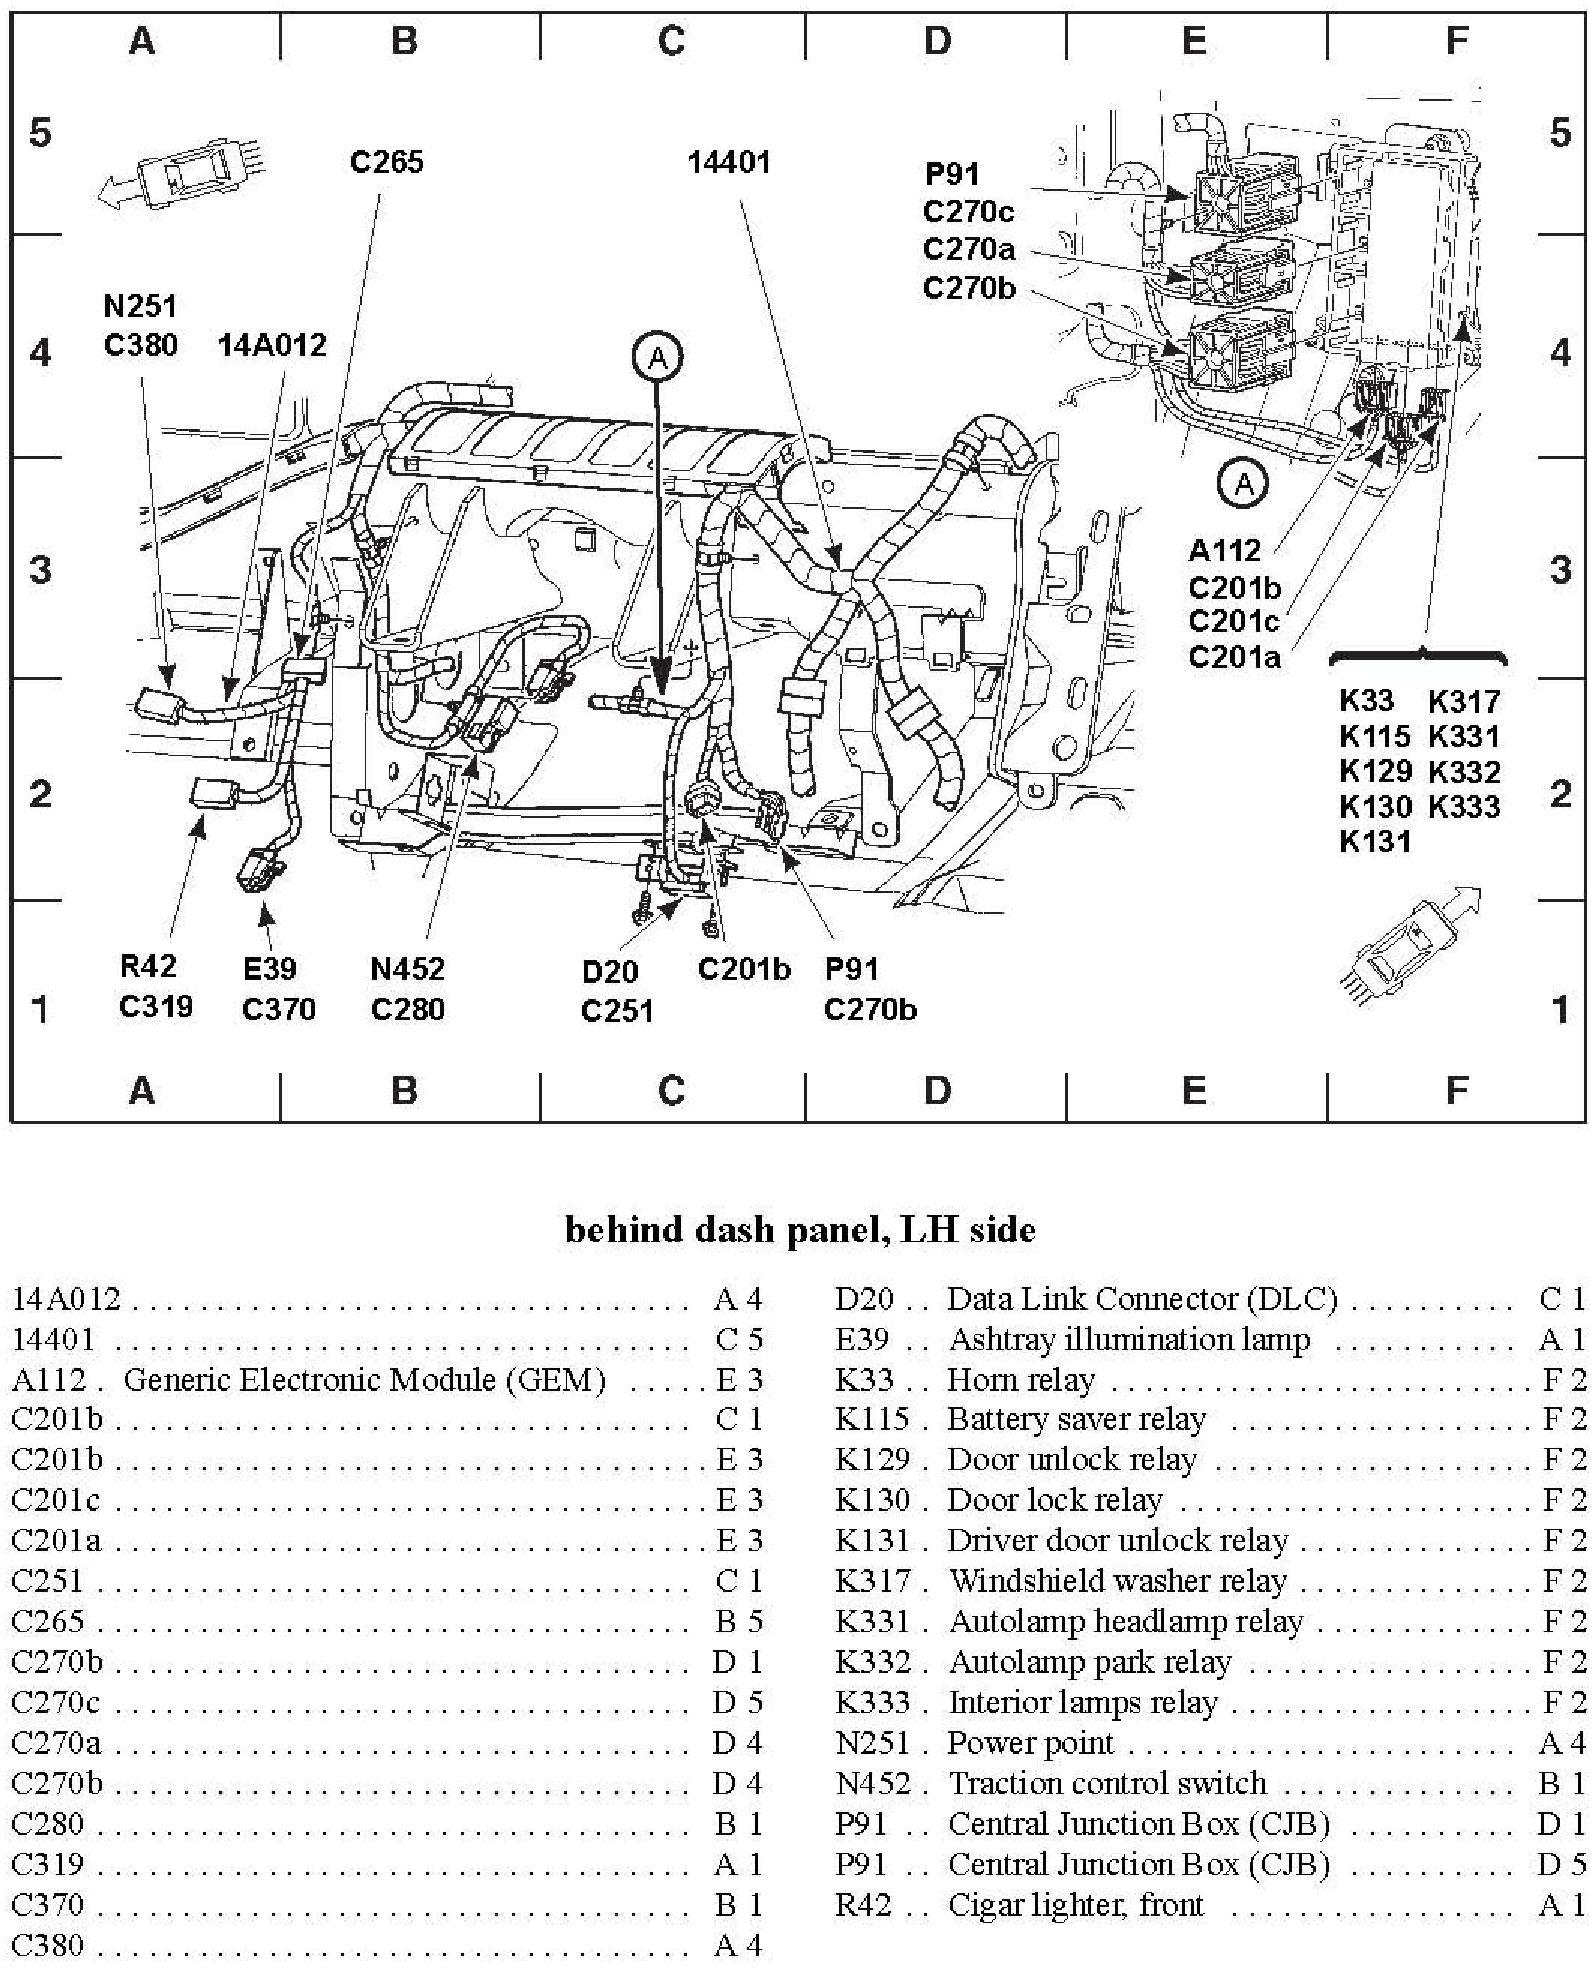 2001 mercury sable fuse box diagram 2001 mercury sable ls fuse box diagram  2000 mercury sable